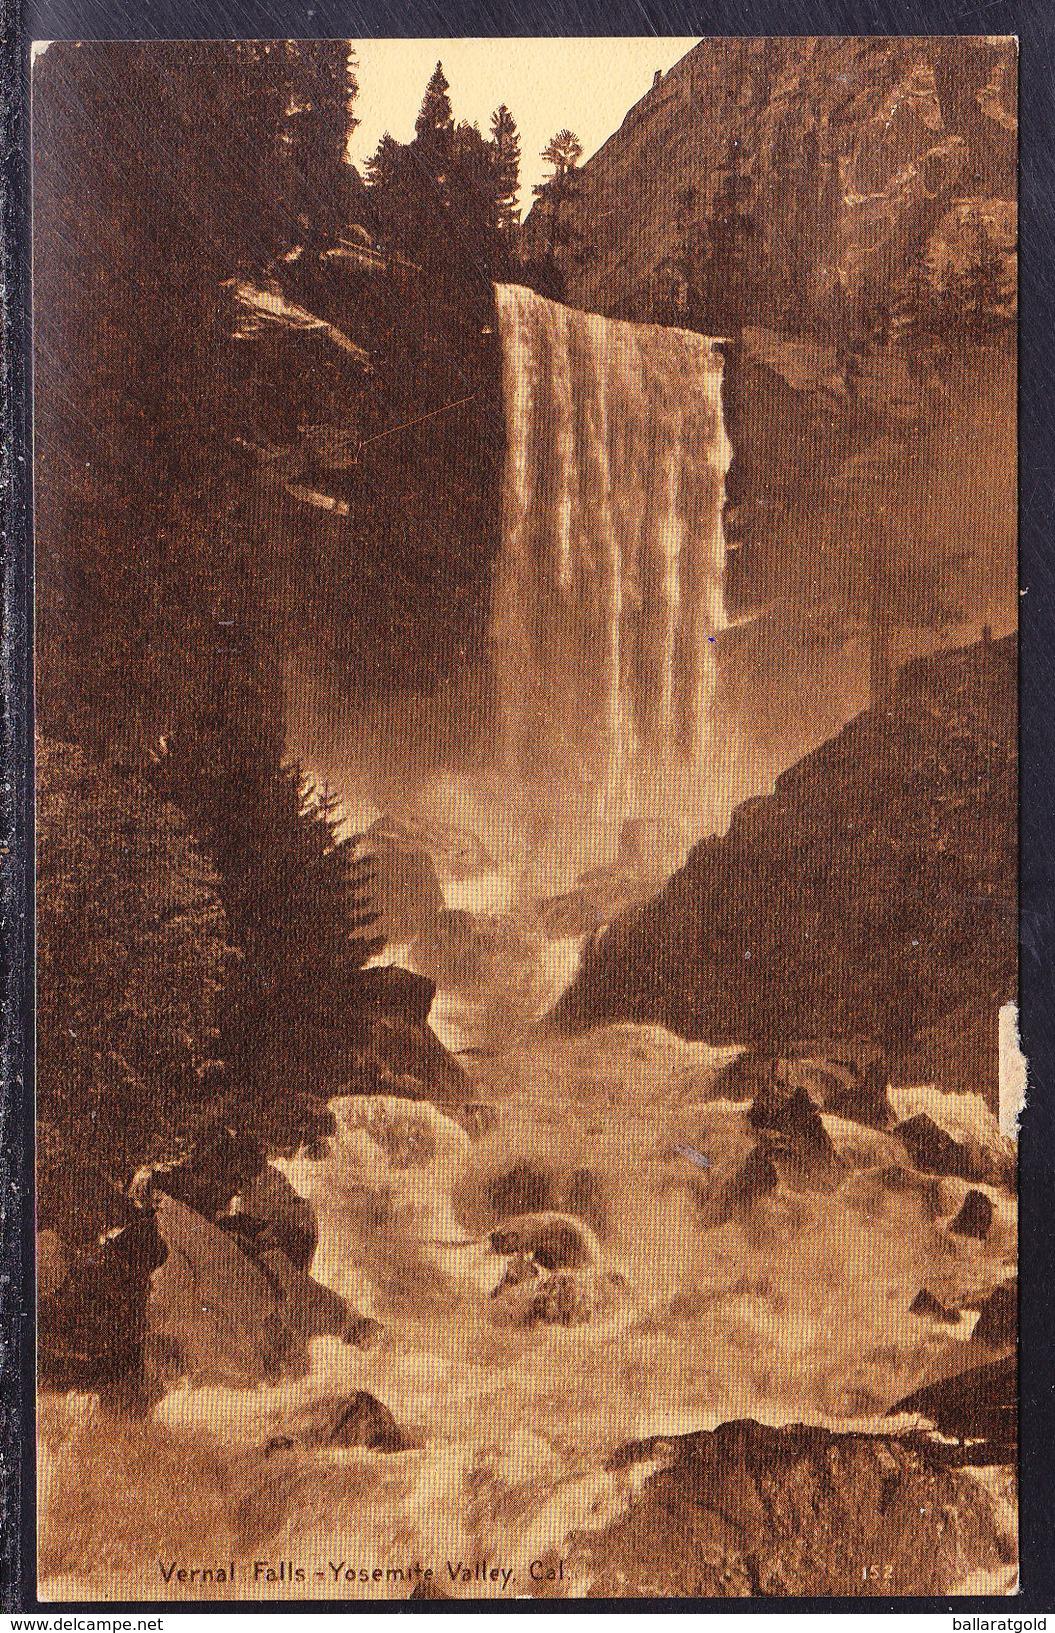 USA C1913 Vernal Falls - Yosemite Valley - Unused - Yosemite